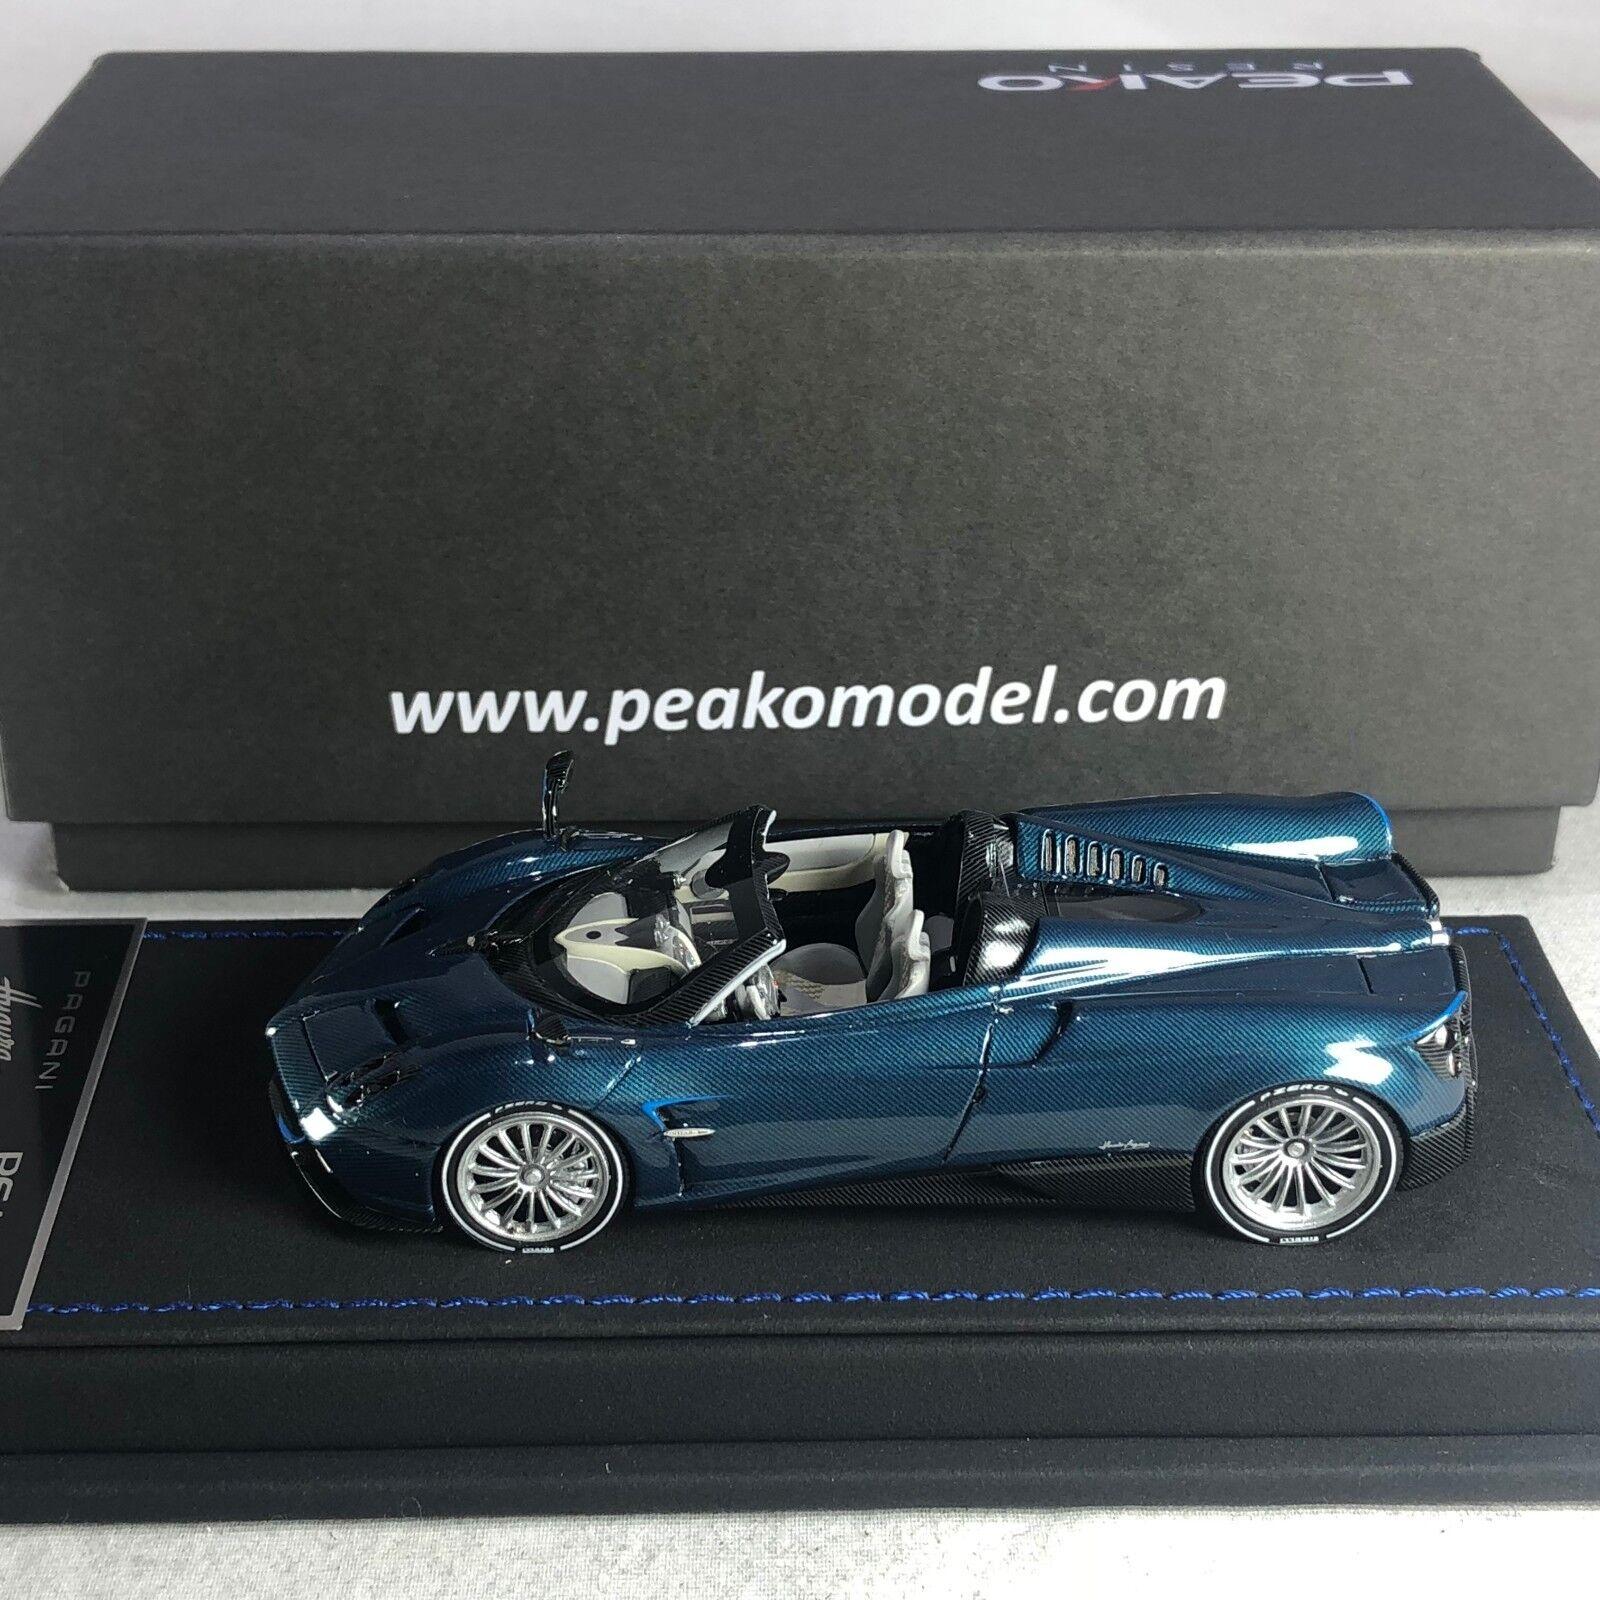 1/43 Scale Peako Model Pagani Huayra Roadster Blue Carbon